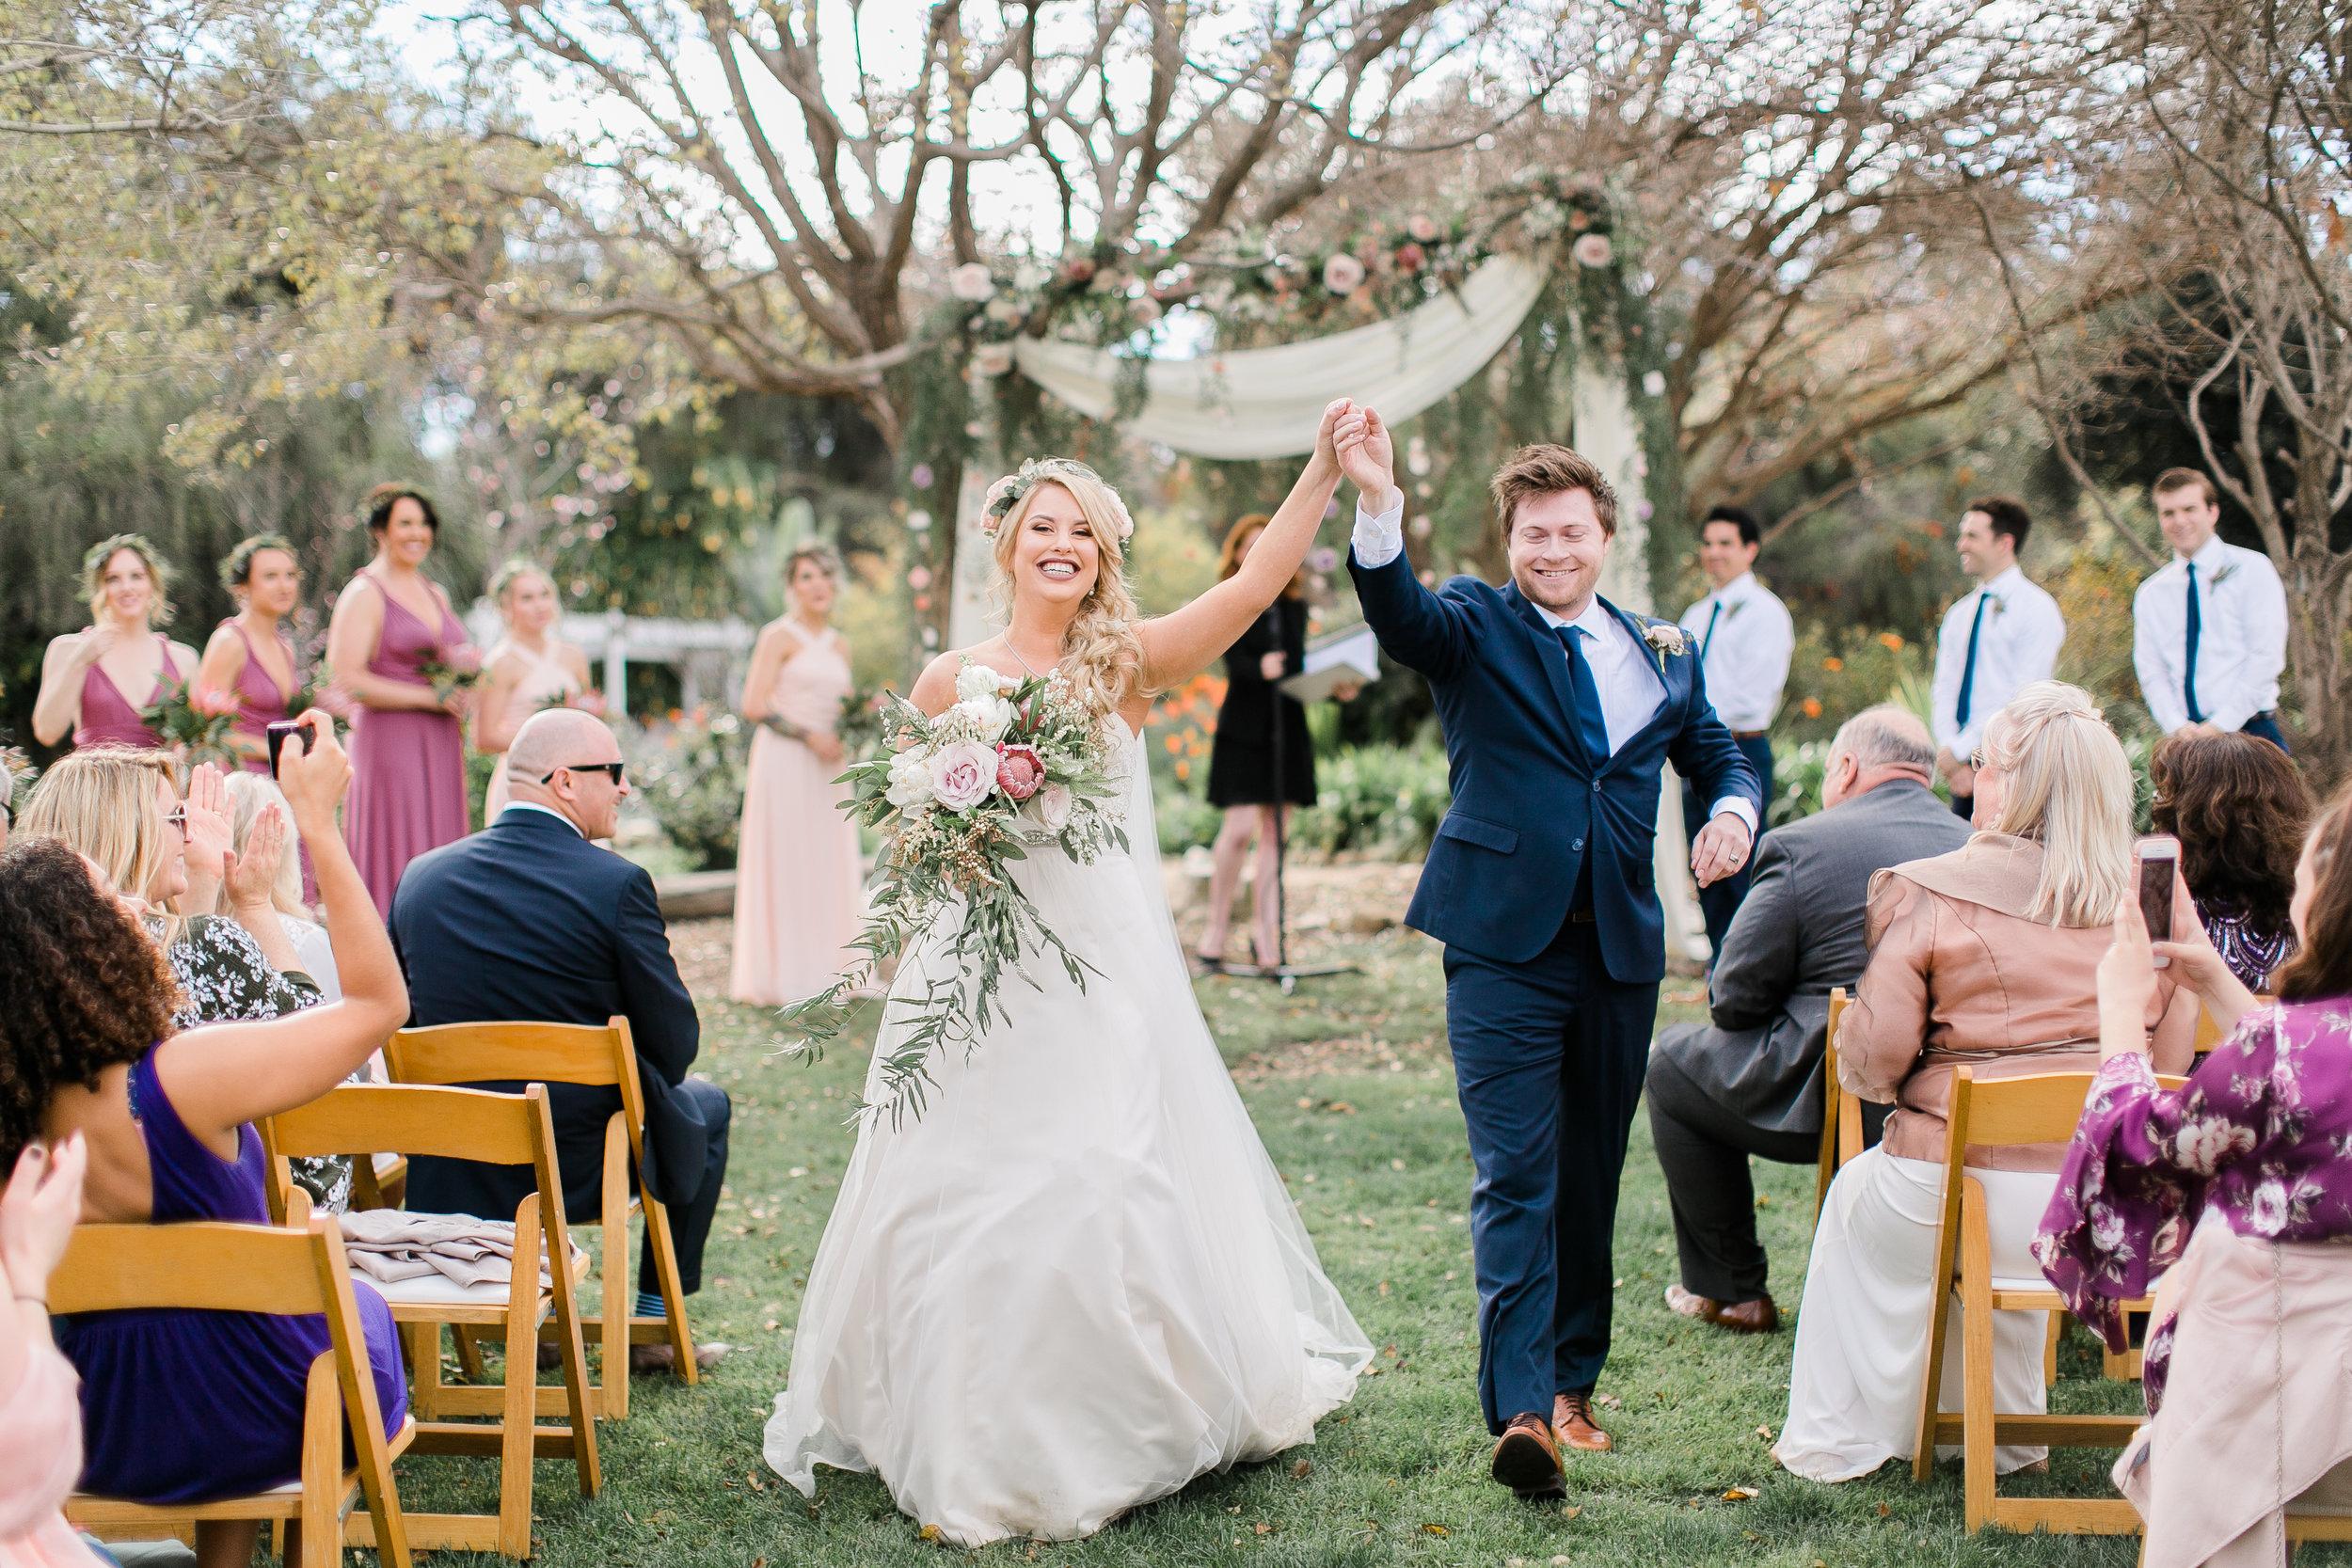 South-Coast-Botanic-Garden-Wedding-Planner34.jpg